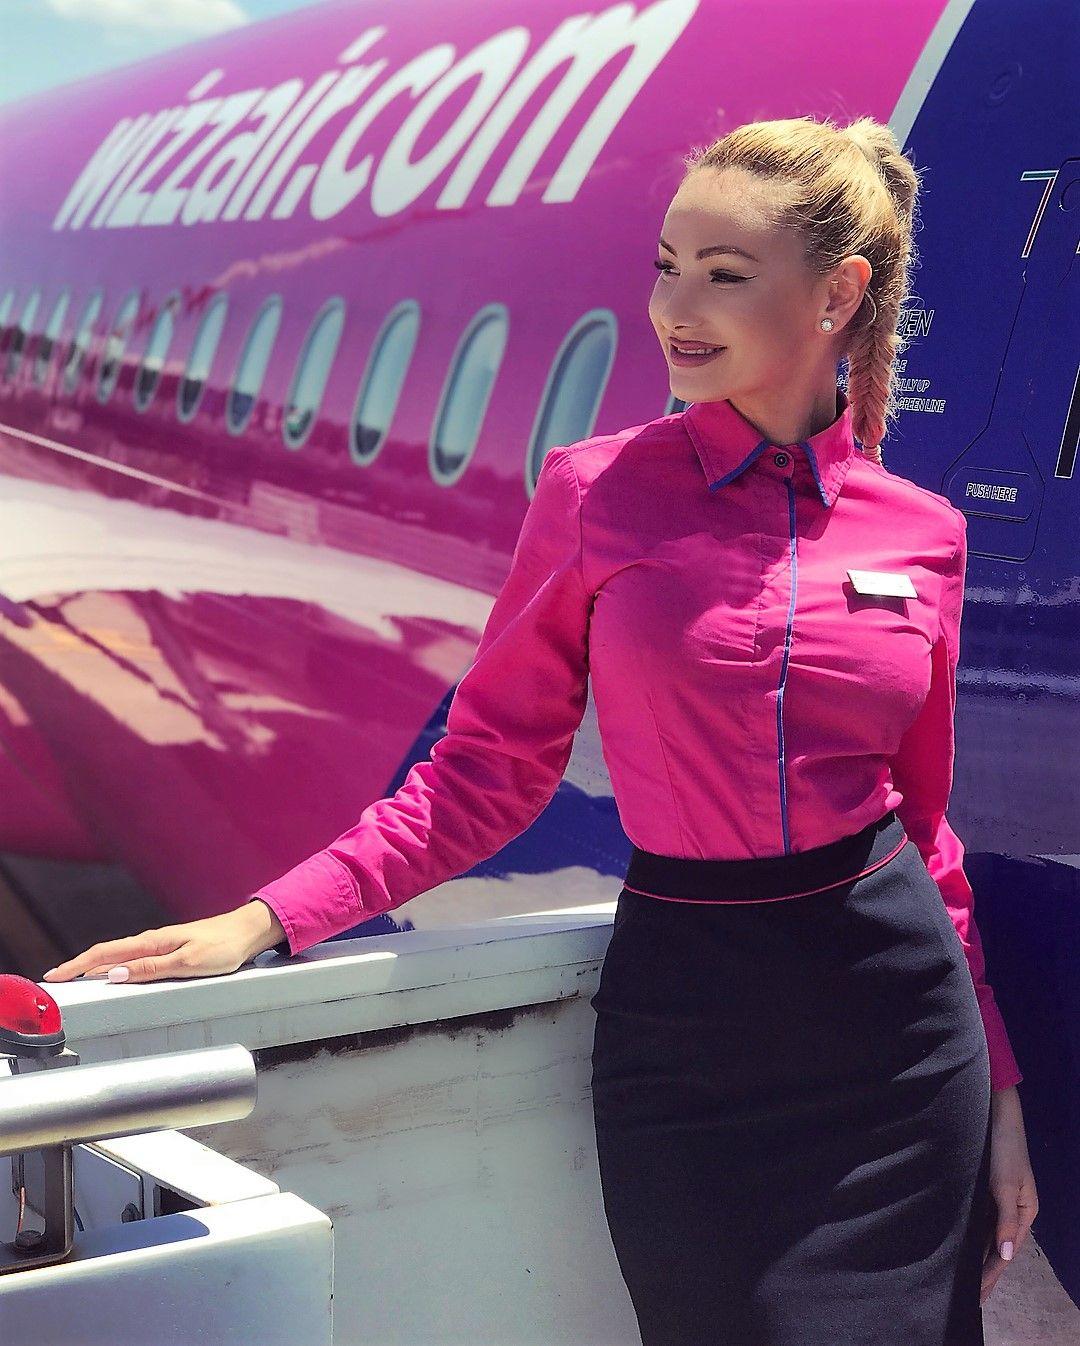 35 Hot Flight Attendants Definitely Will Have Your